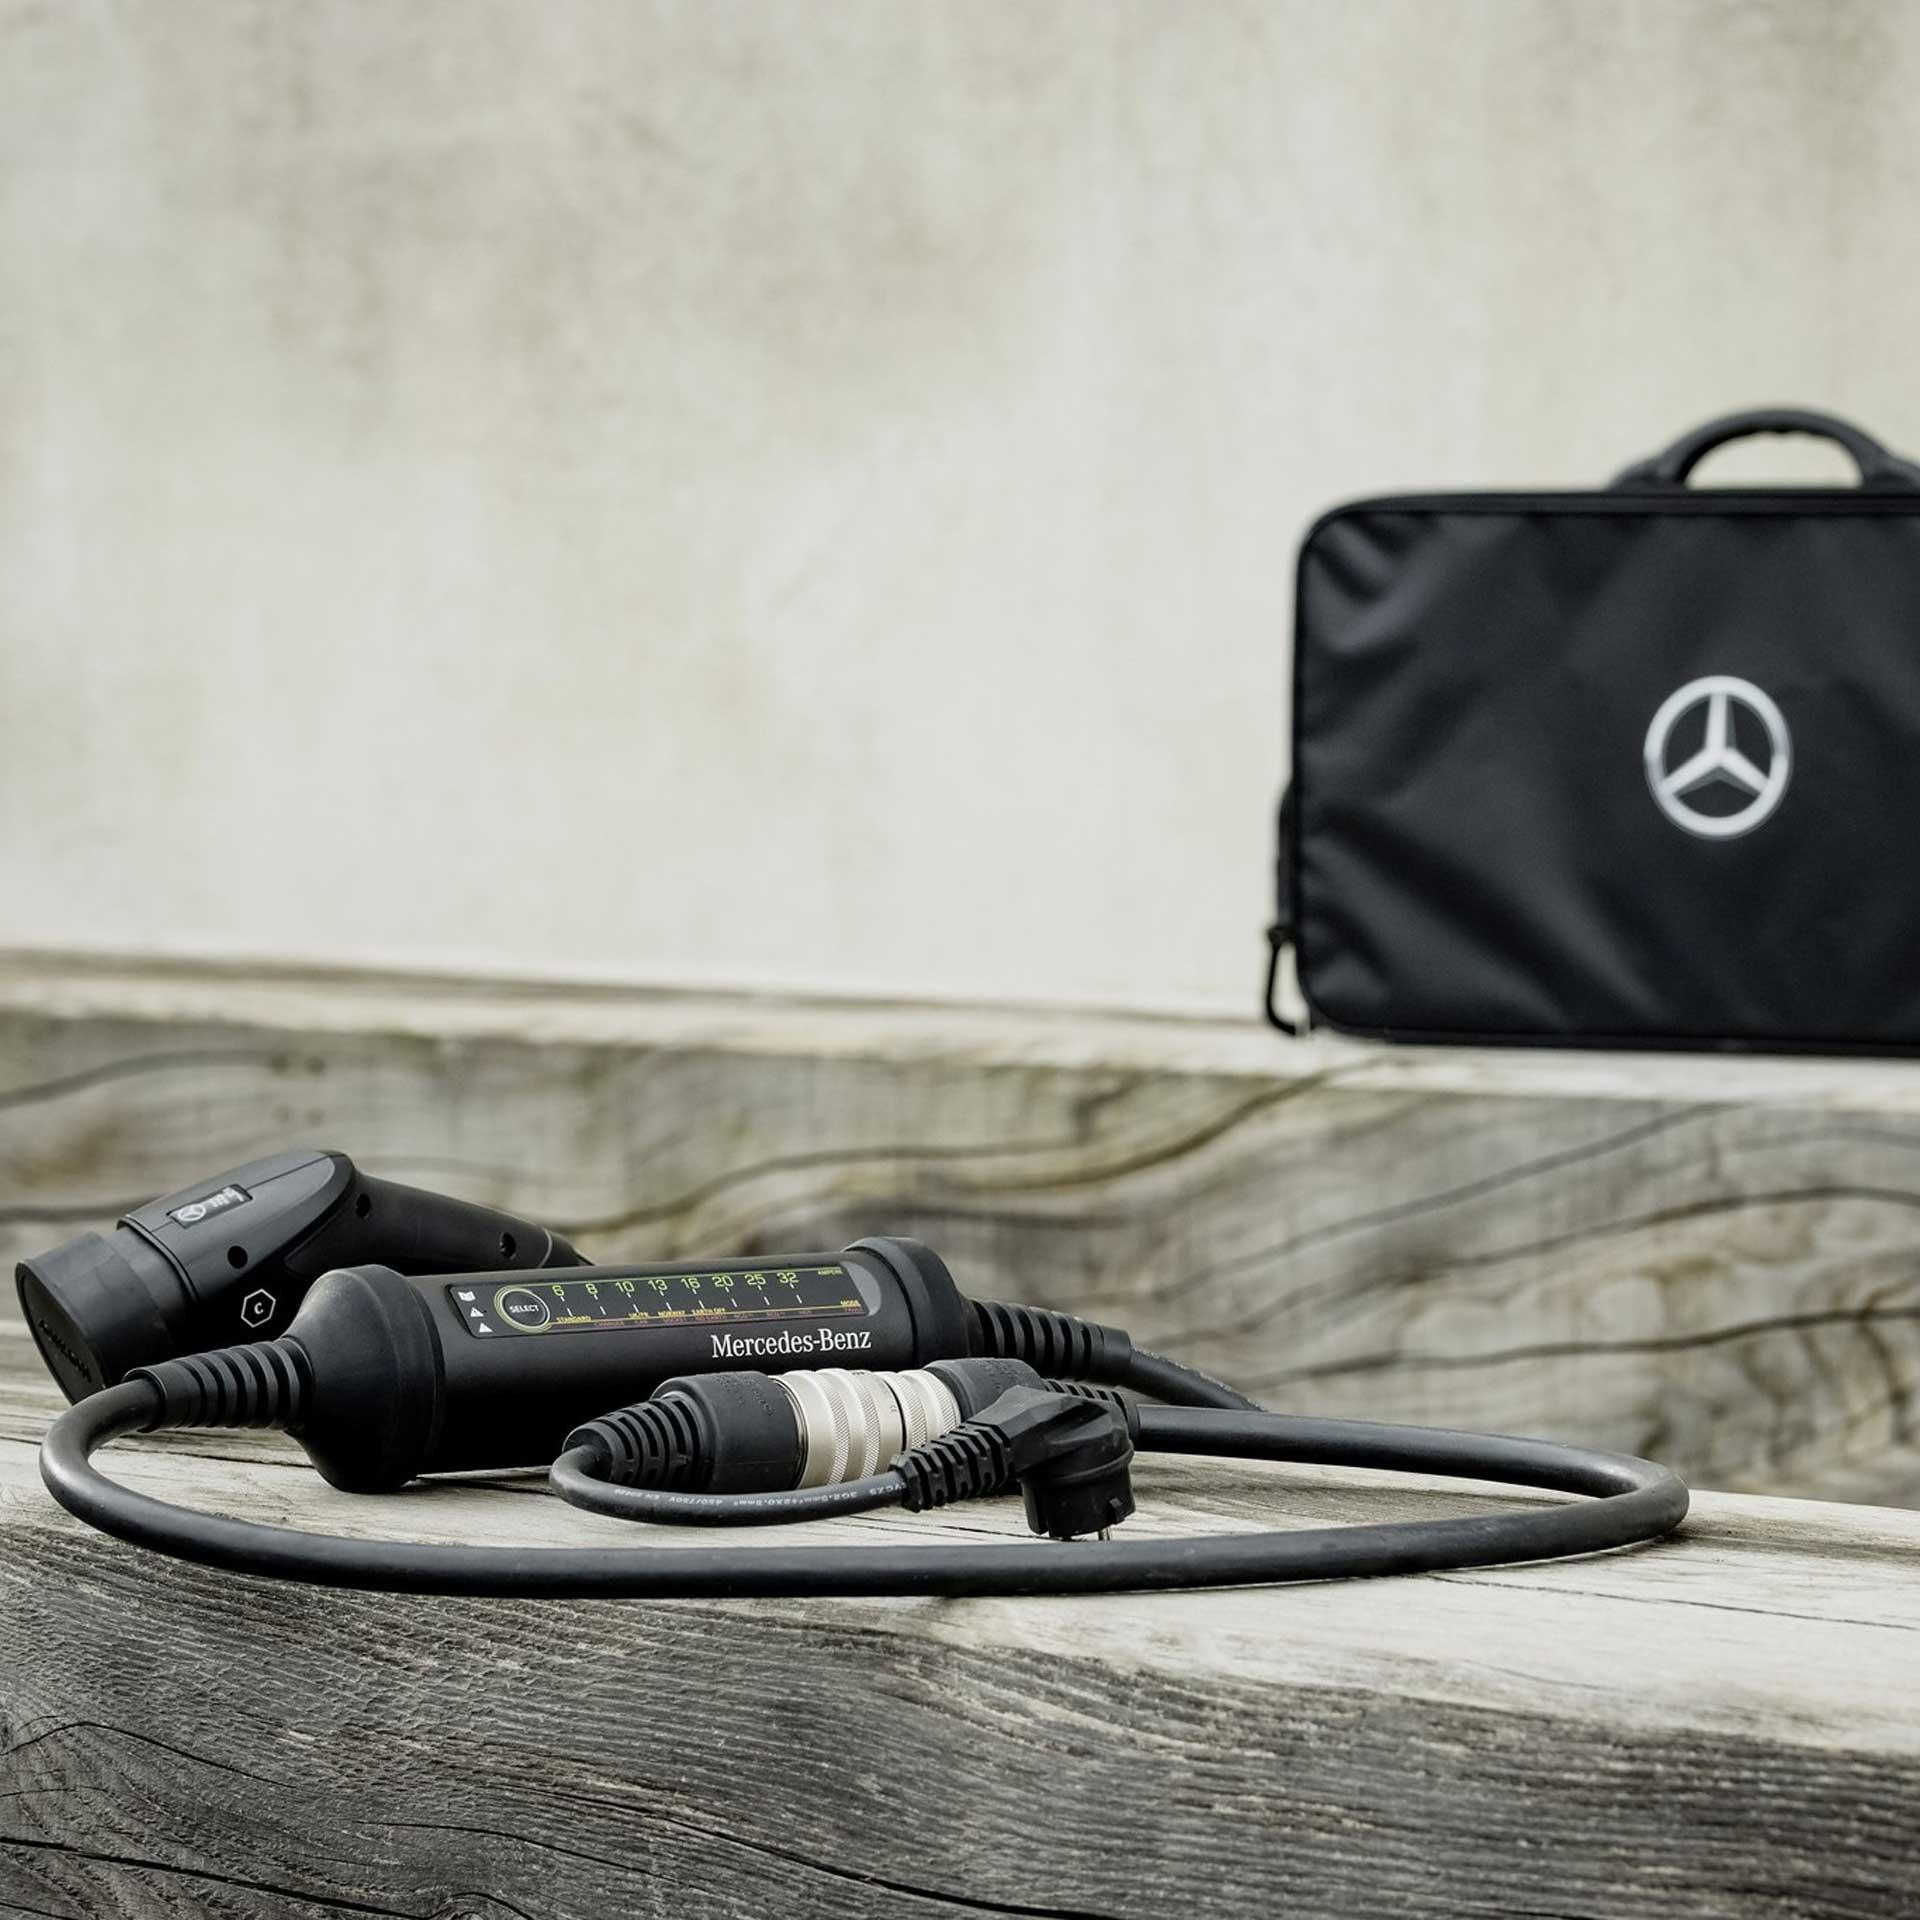 Mercedes-Benz flexibles Ladesystem 16/3-phasig 5-teilig